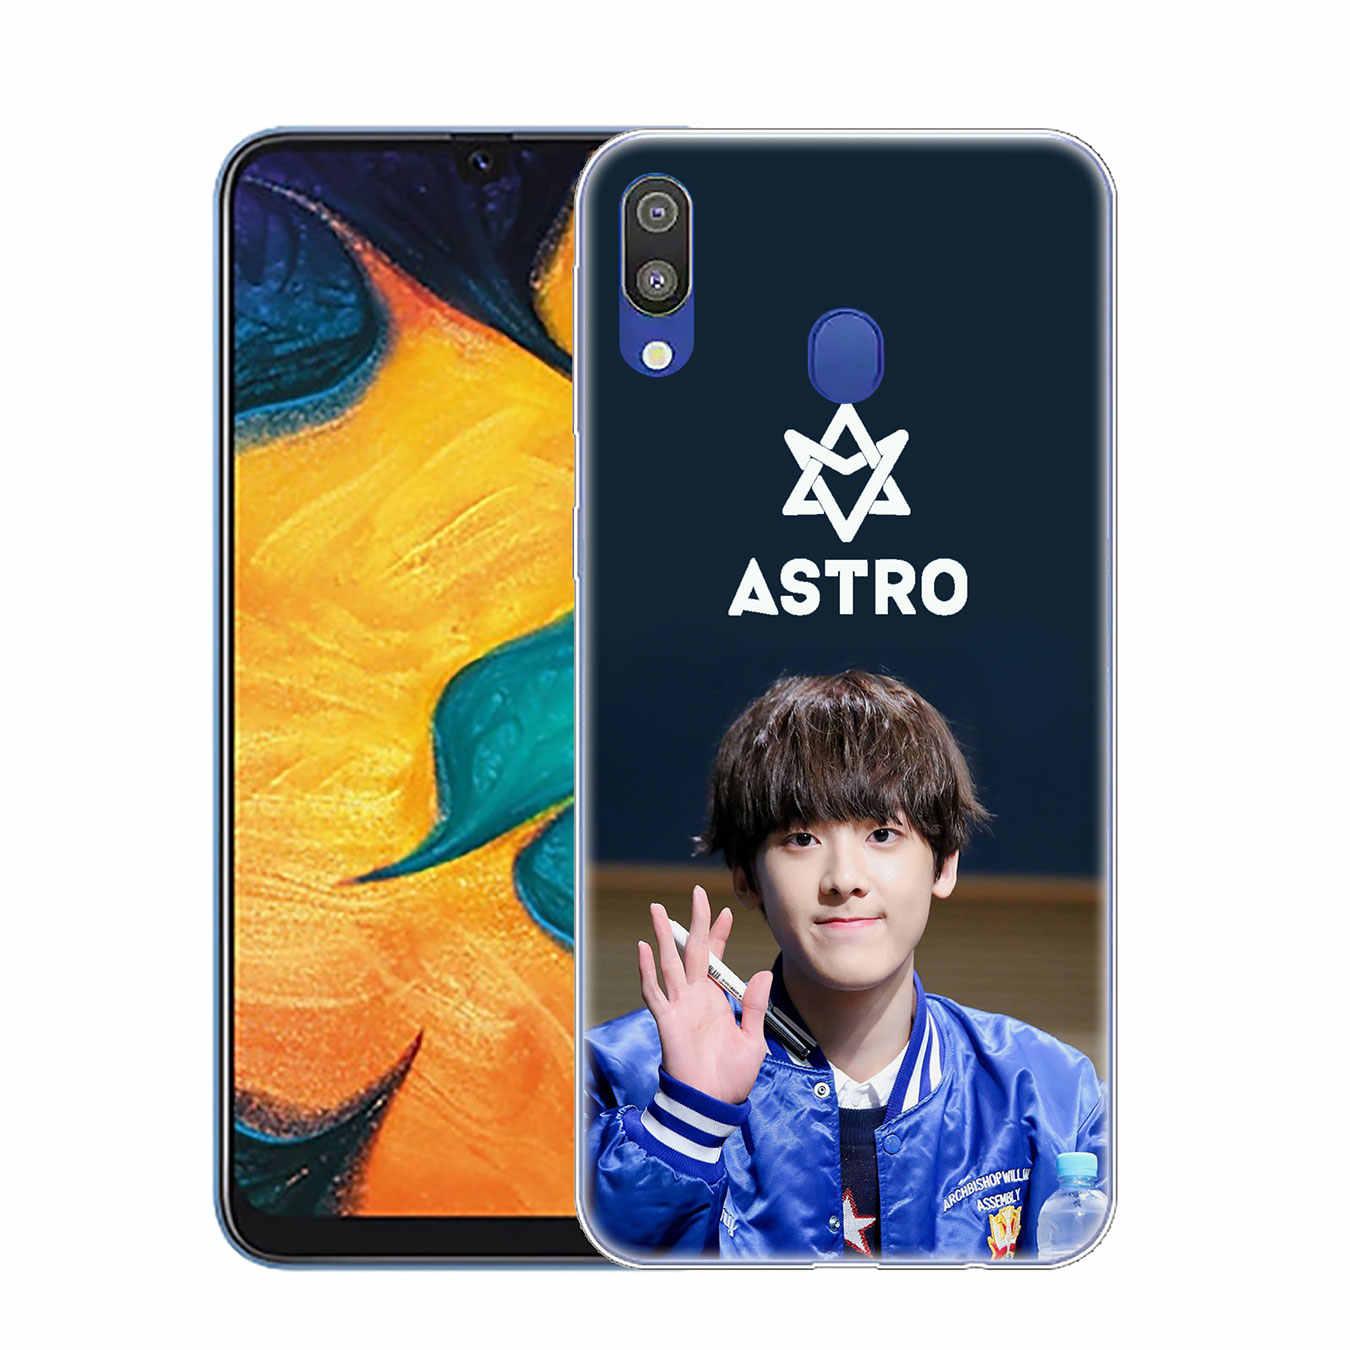 Lavaza KPOP ASTRO hartvormige Hard Telefoon Case voor Samsung Galaxy A10 A20 A30 A40 A50 A60 A70 M10 M20 m30 M40 A20e Cover